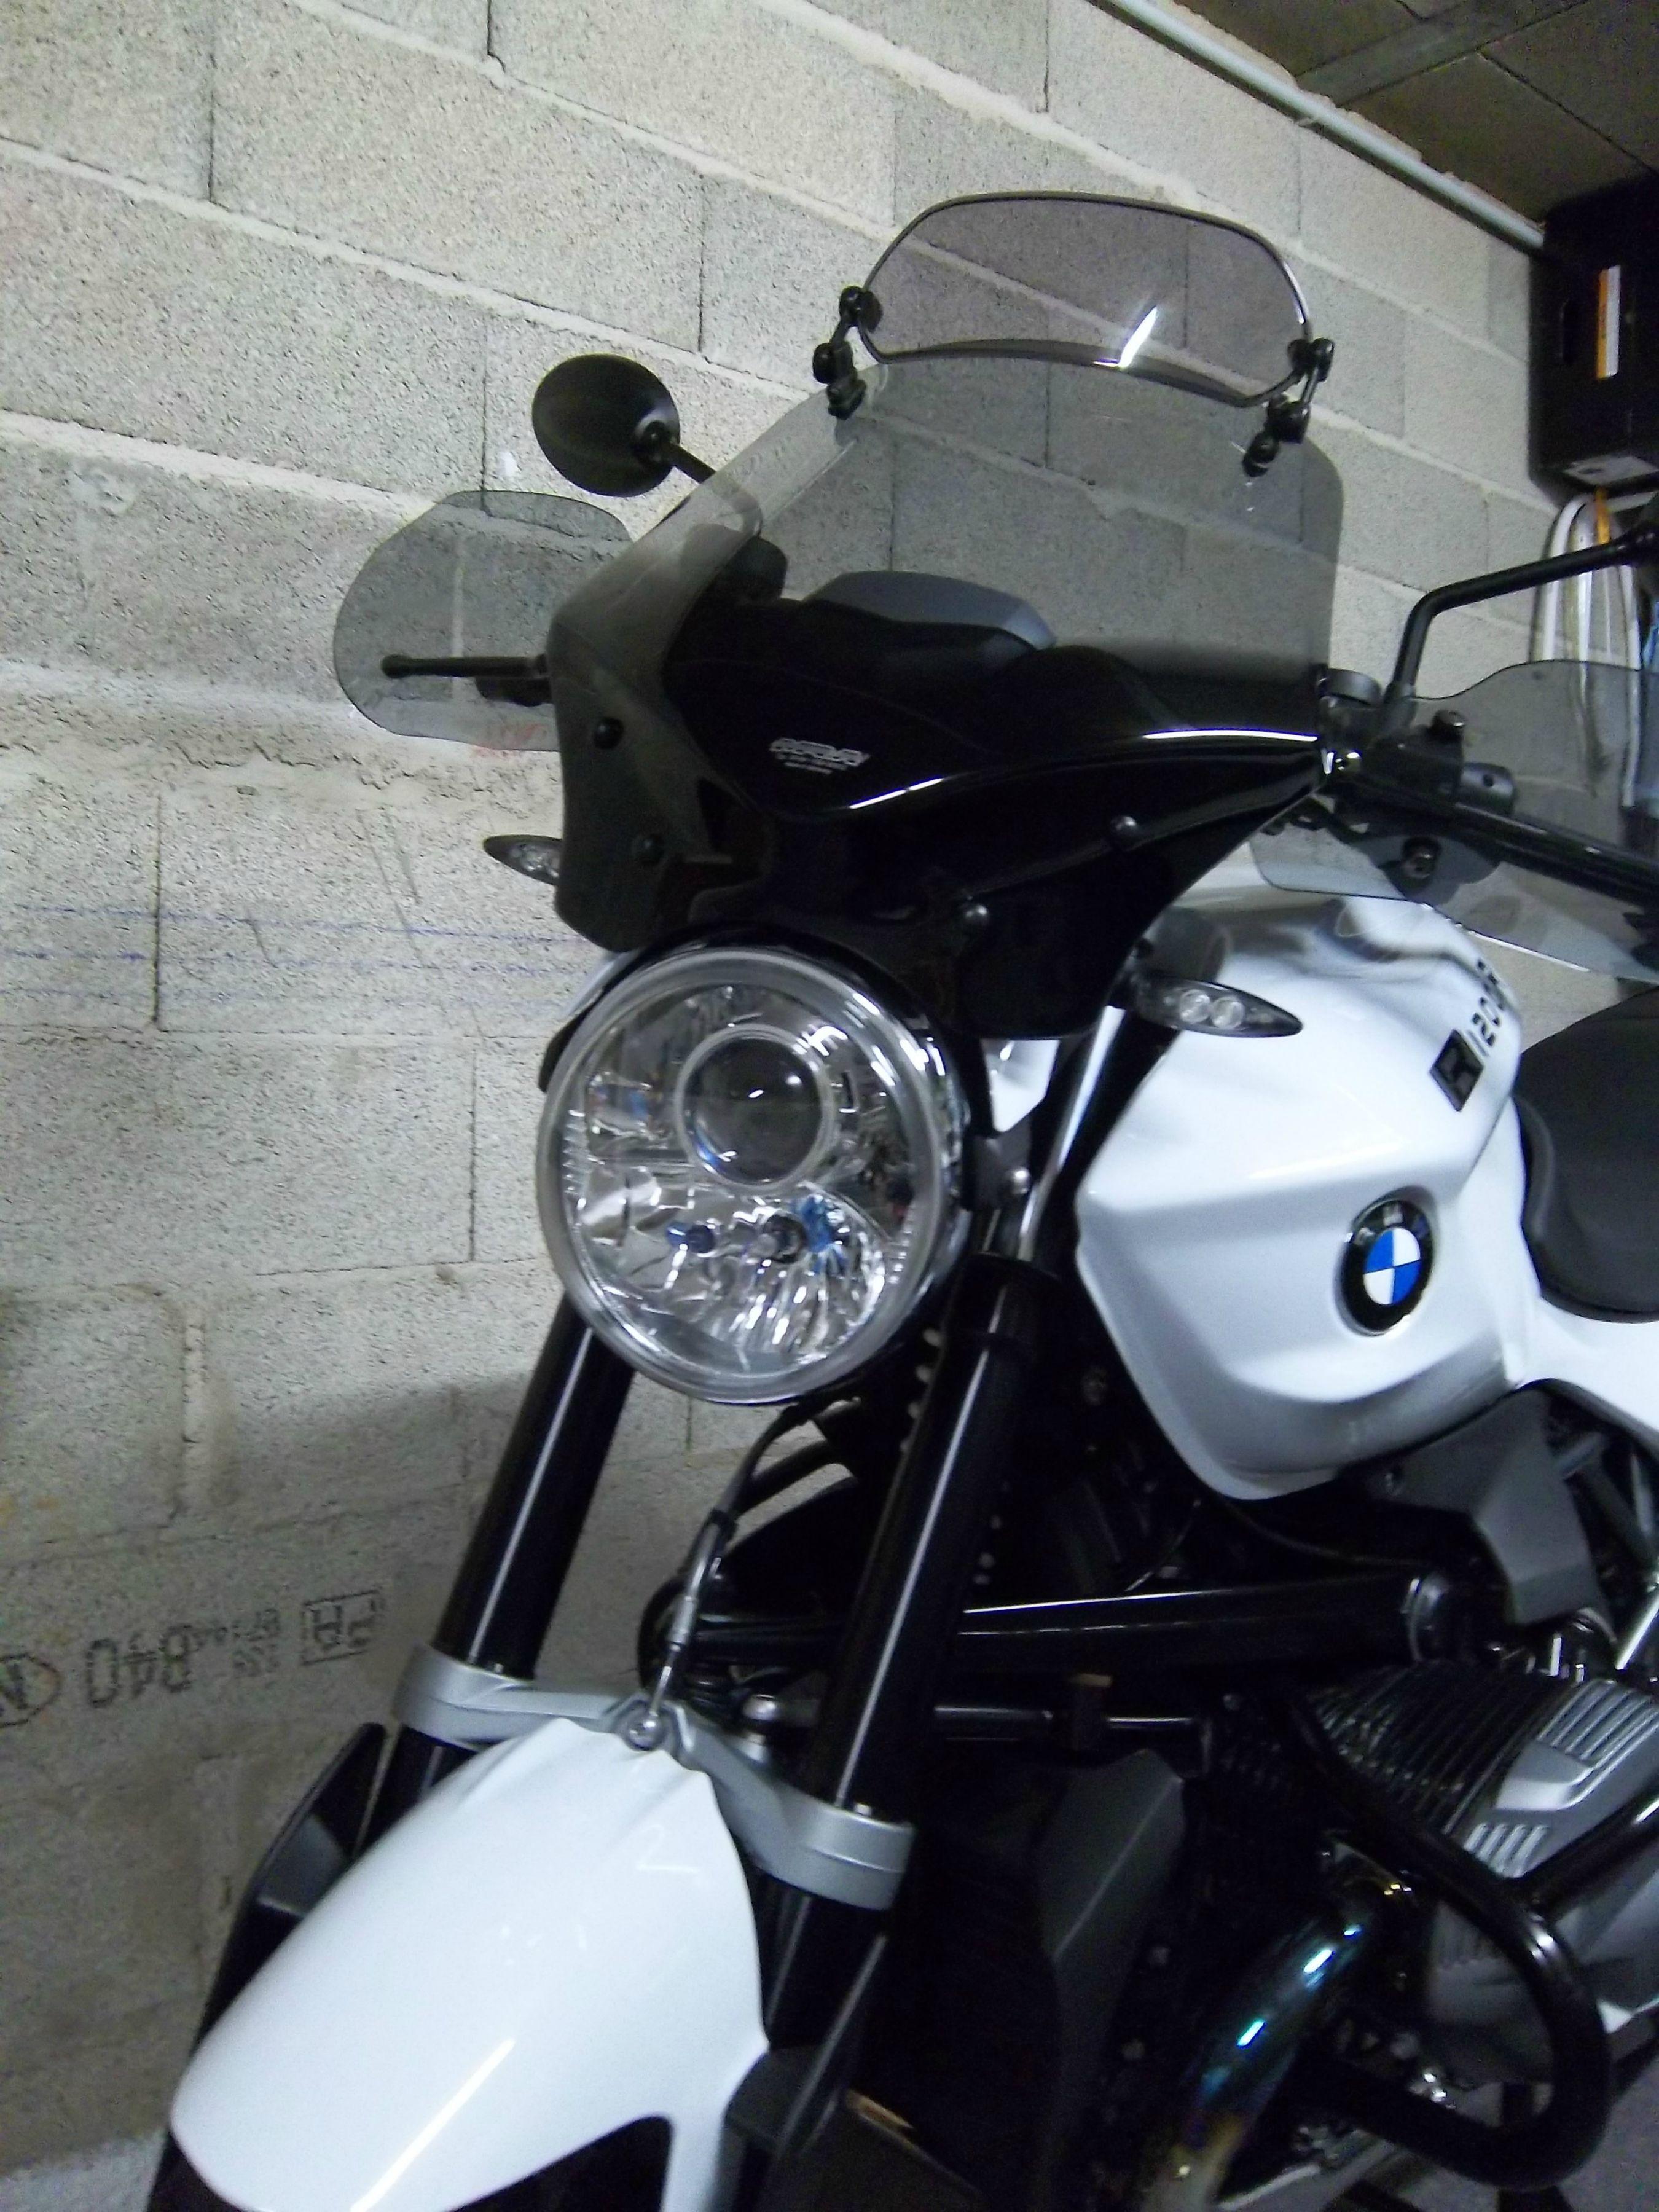 BMW R1200R bi-xenon projector full write-up